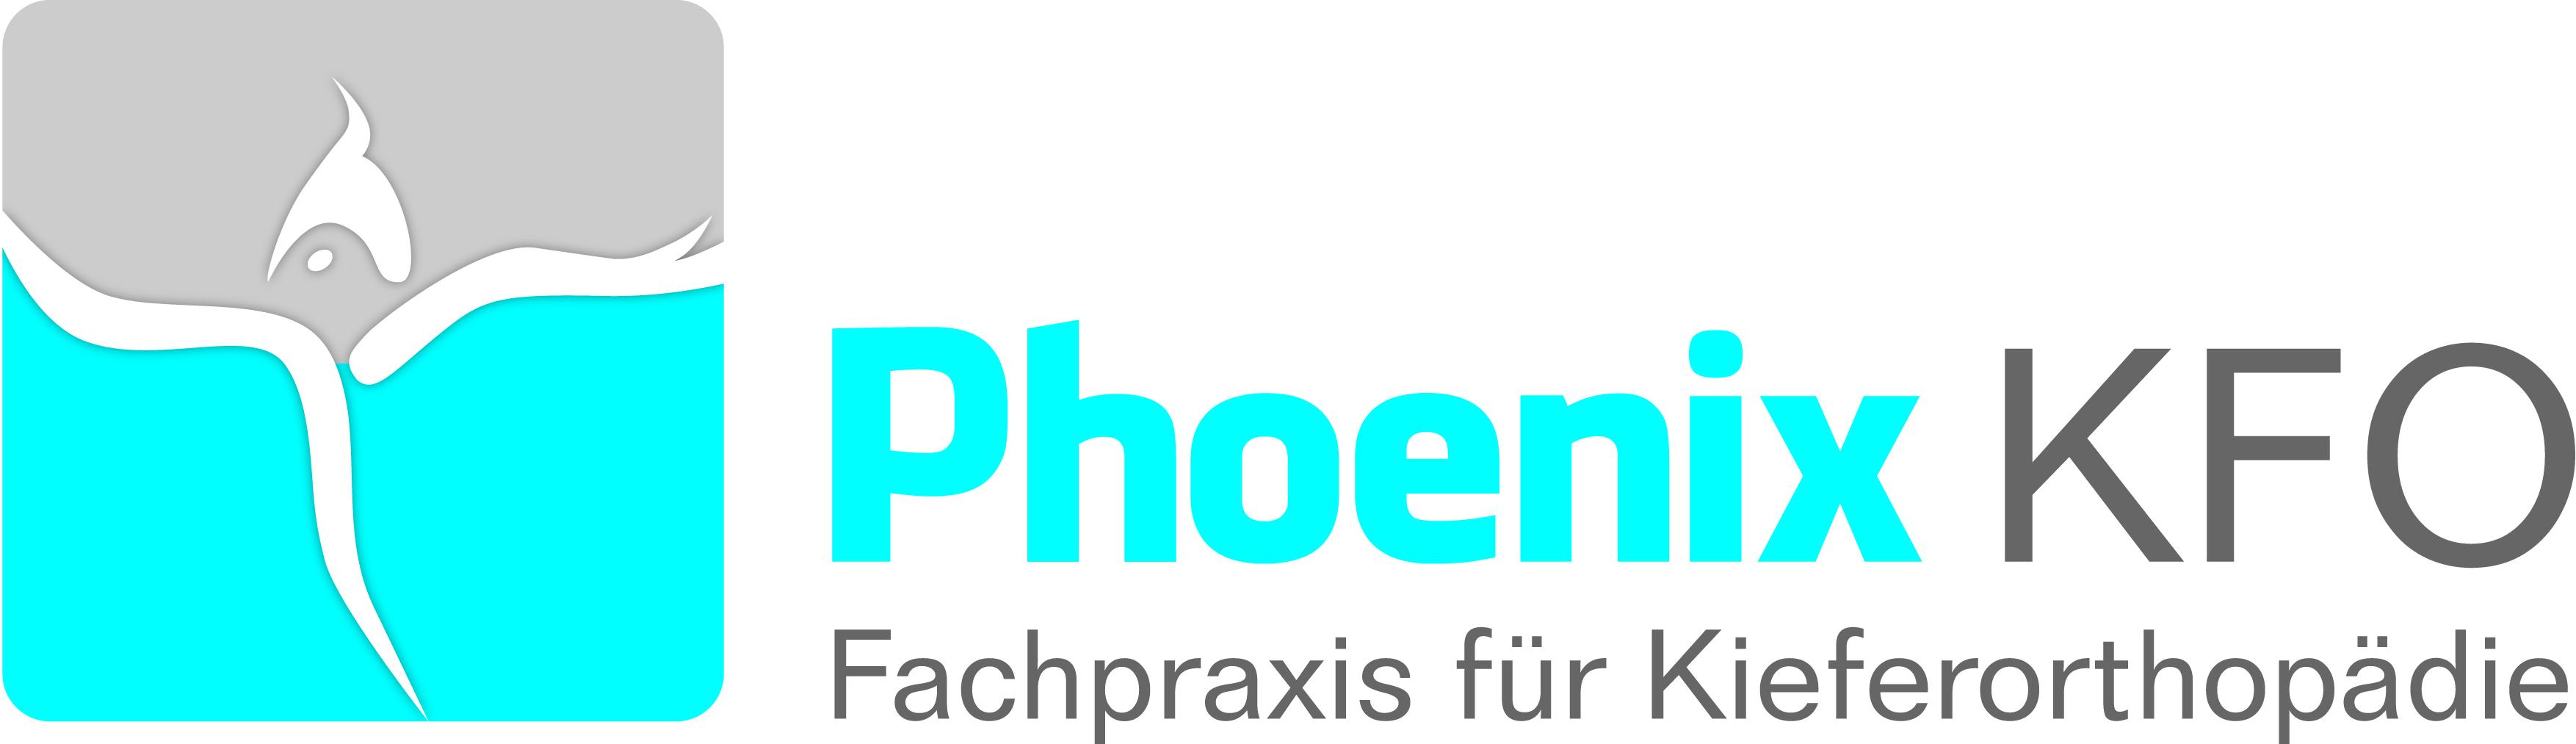 Phoenix KFO, Fachpraxis für Kieferorthopädie